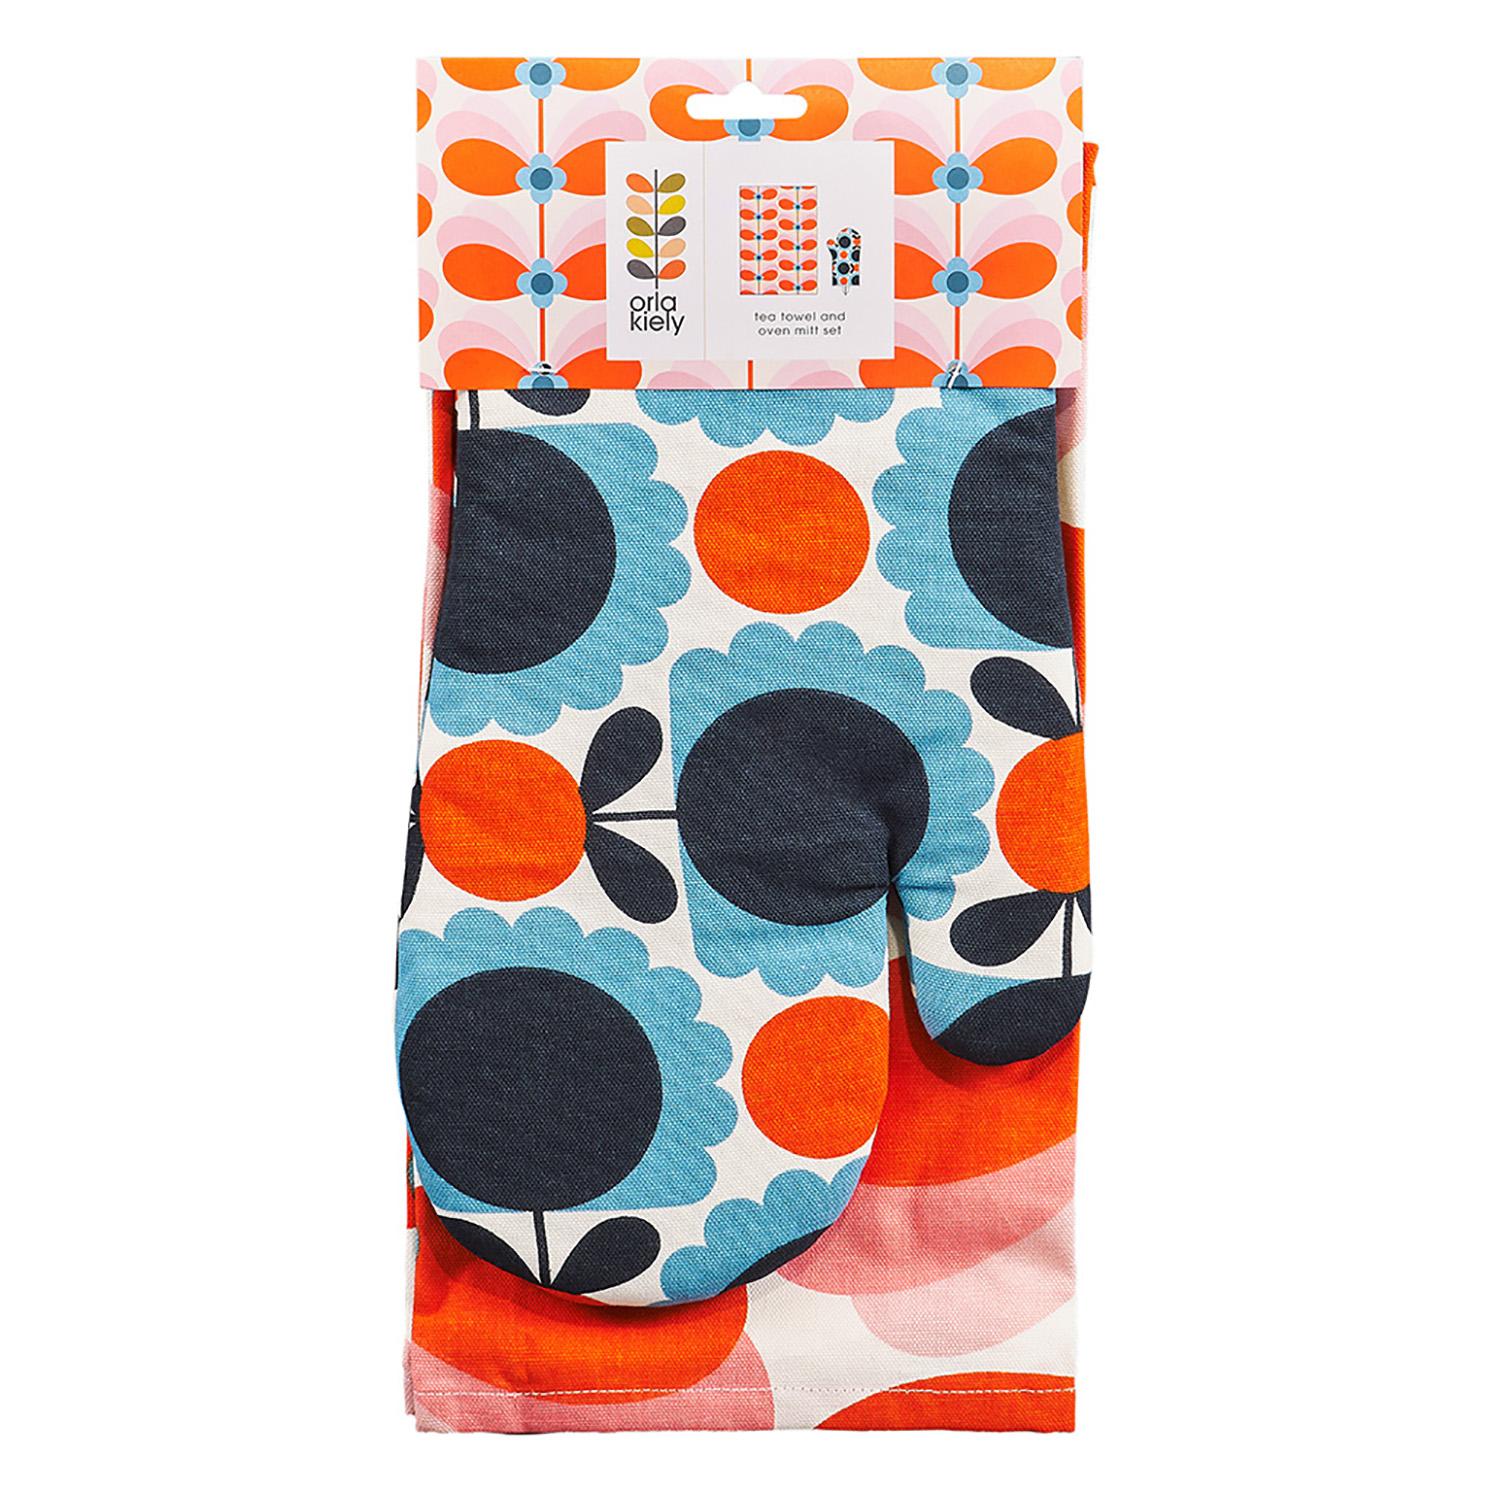 Orla Kiely – Butterfly Stem Tea Towel and Scallop Flower Oven Mitt Set